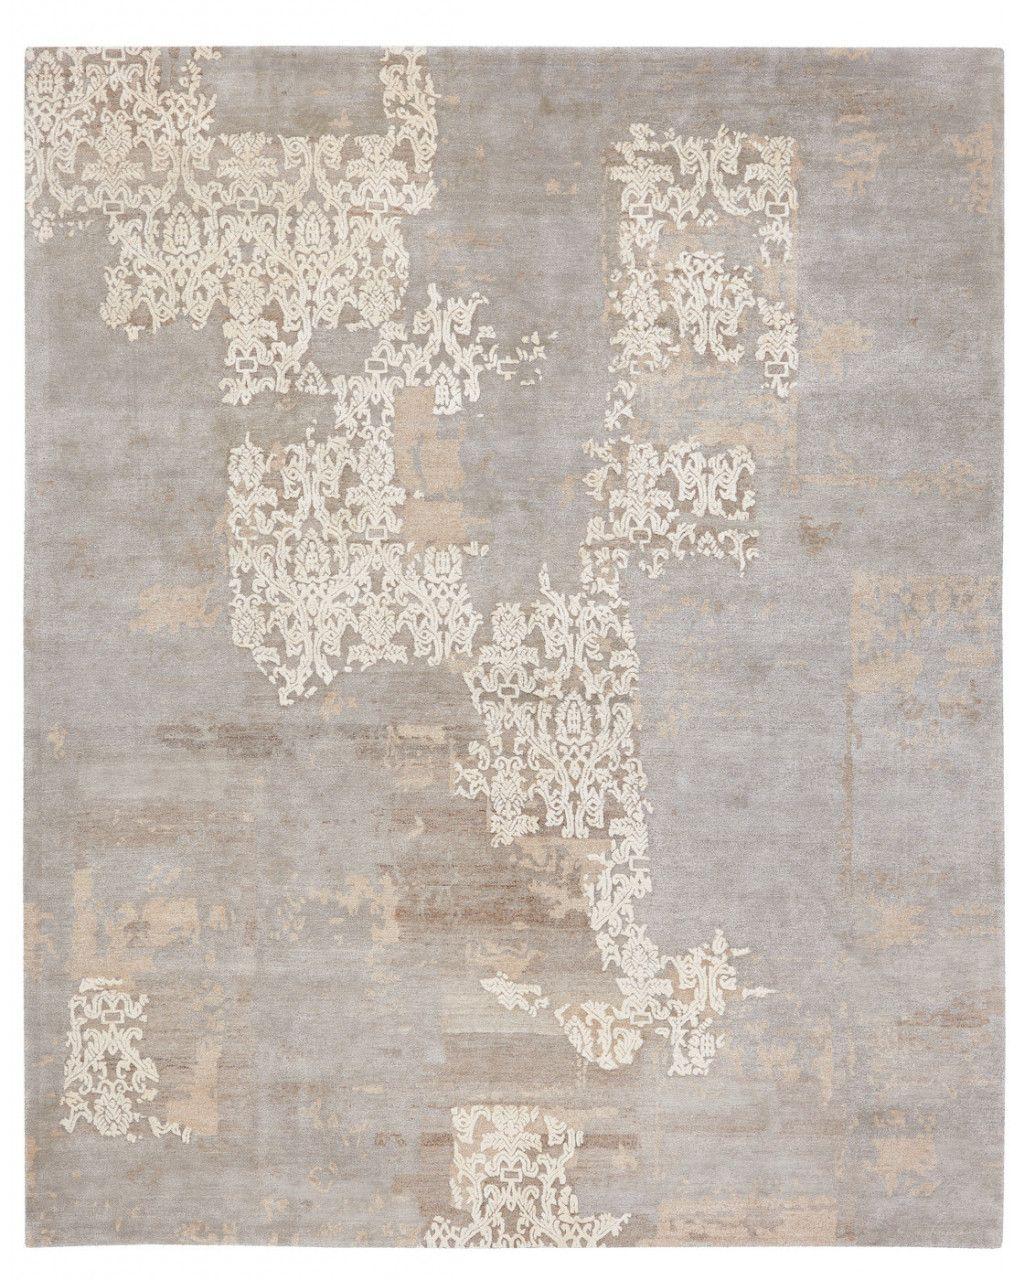 Teppich Boro 10 In 2019 Teppiche Rugs Plush Carpet Und Rugs On